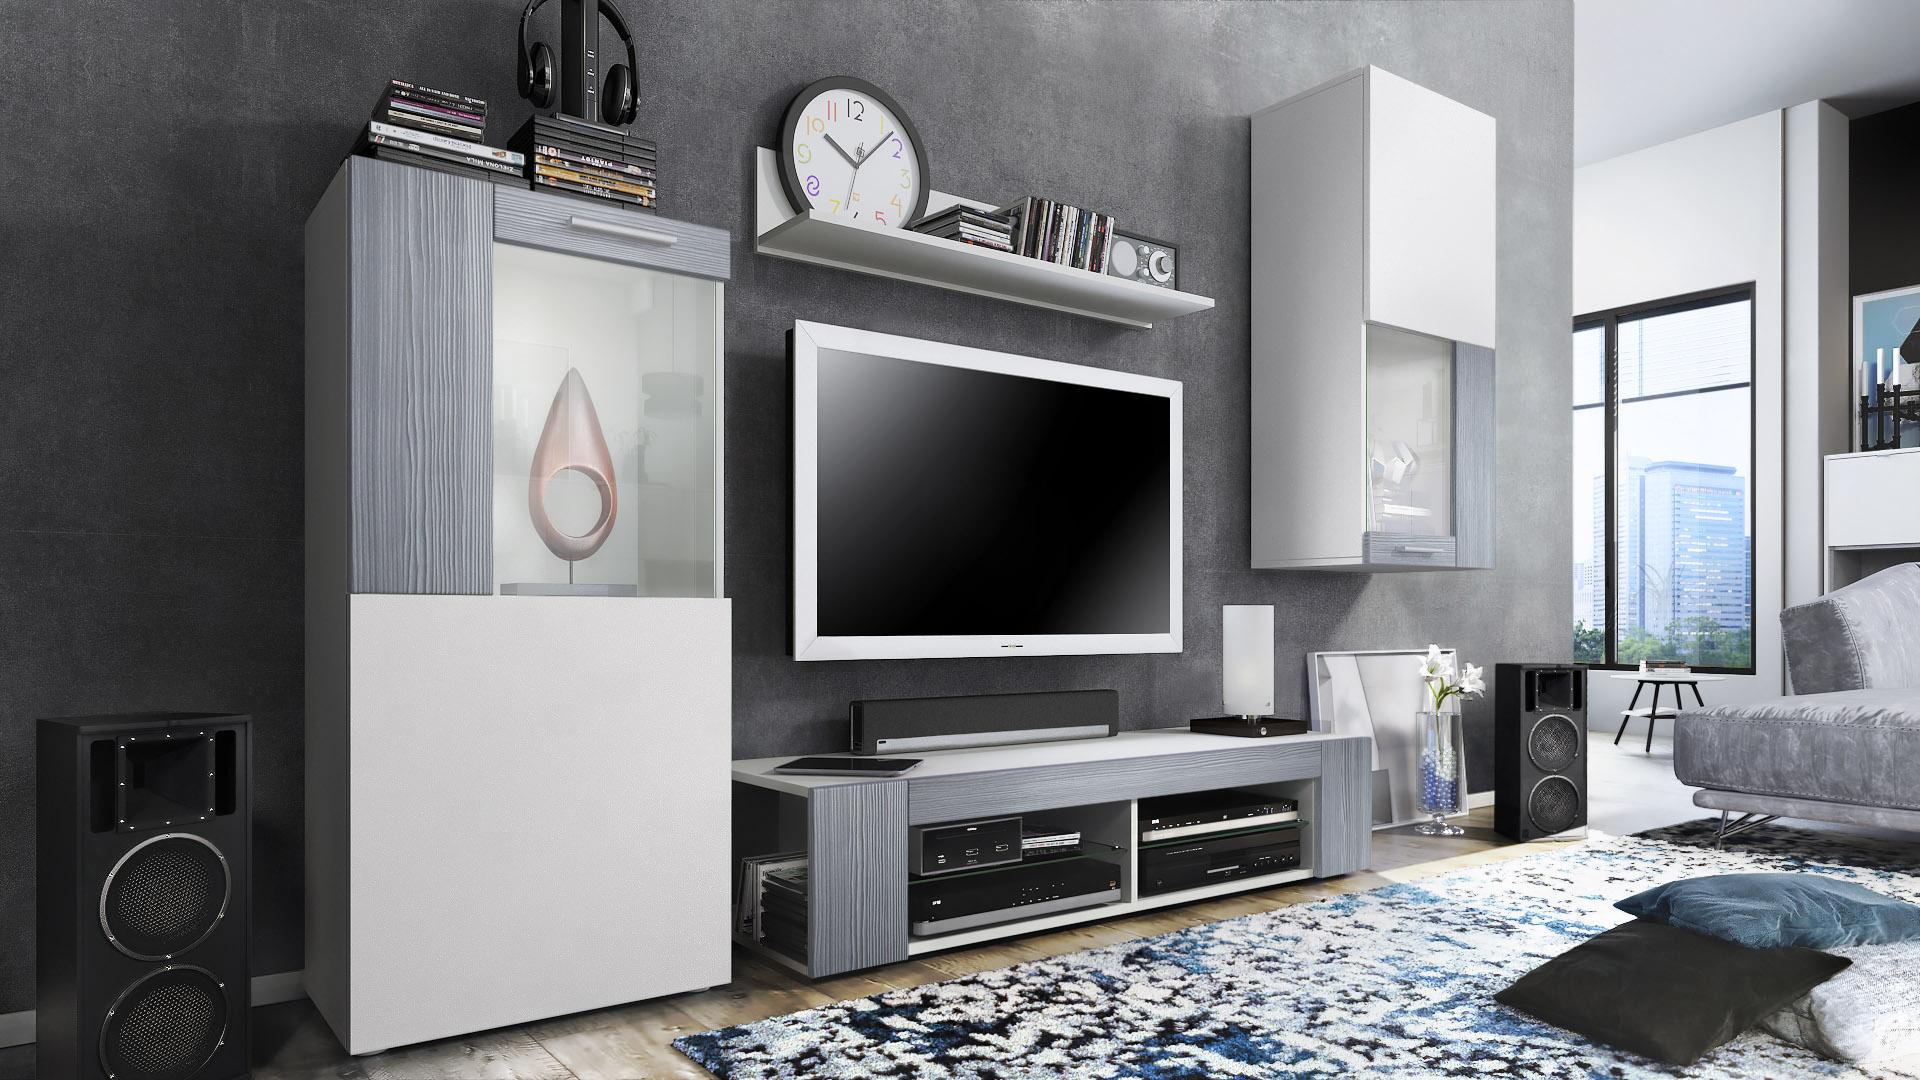 Combinaison Murale Vitrine Meuble Tv Armoire Basse Movie Blanc  # Armoire Basse Tele